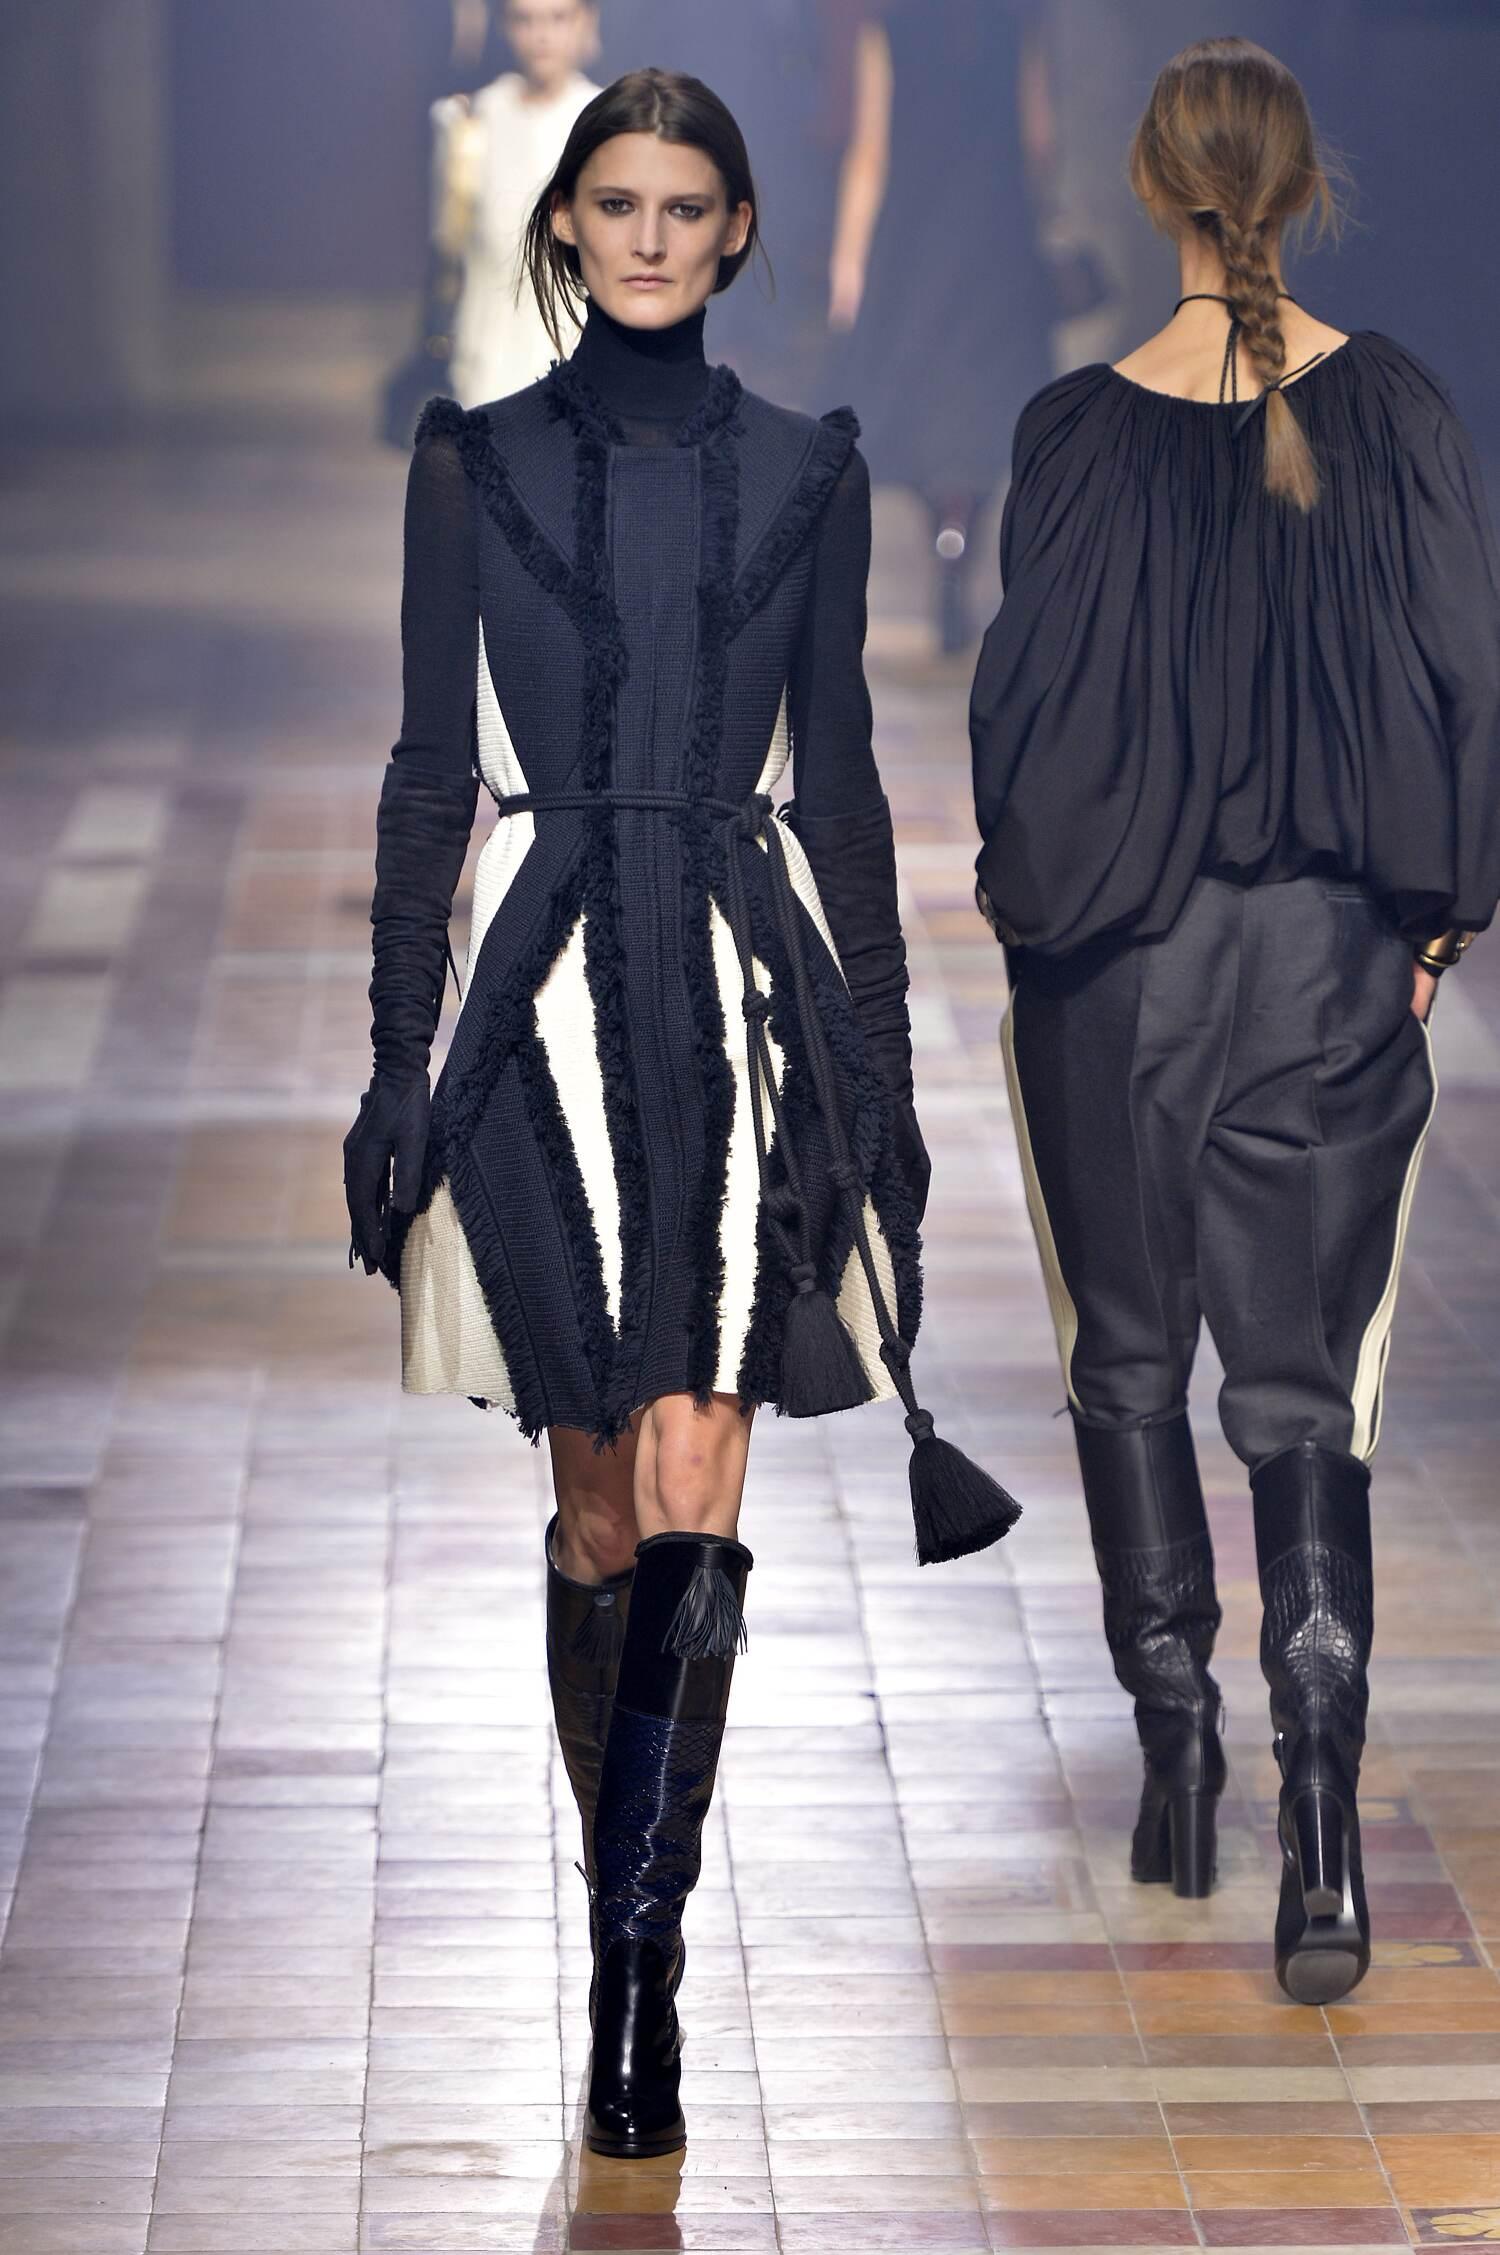 2015 Fashion Woman Model Lanvin Collection Catwalk